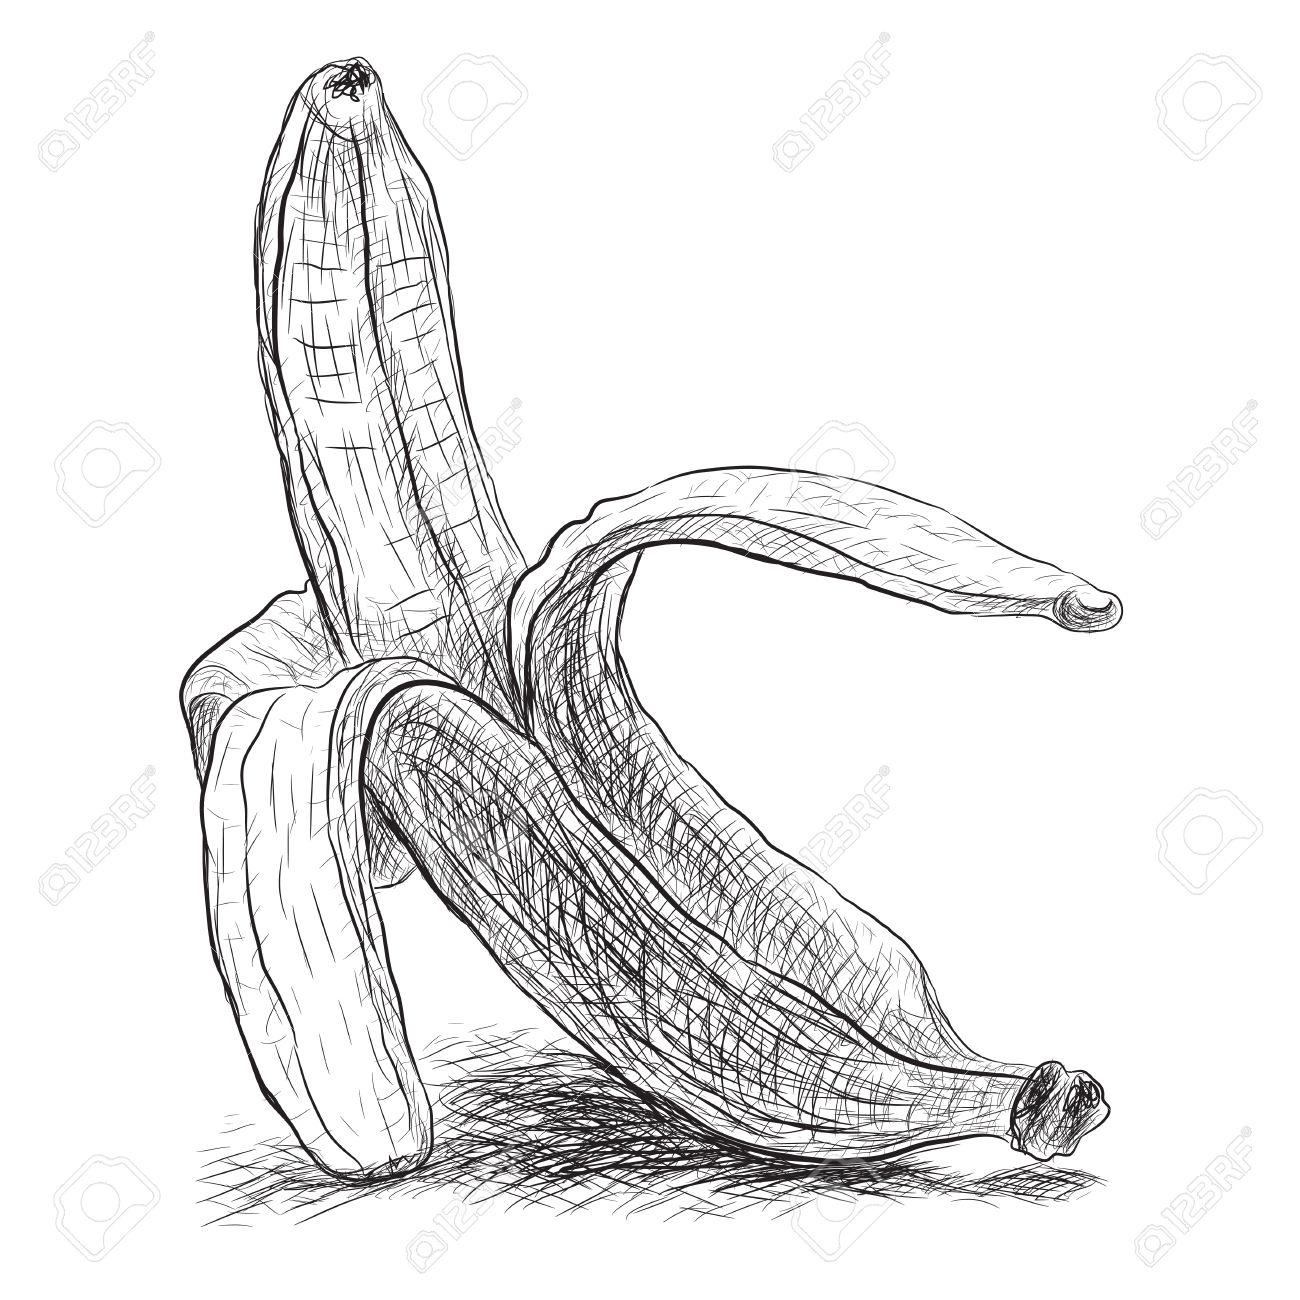 1300x1300 Sketch Peeled Banana, Vector Illustration Royalty Free Cliparts